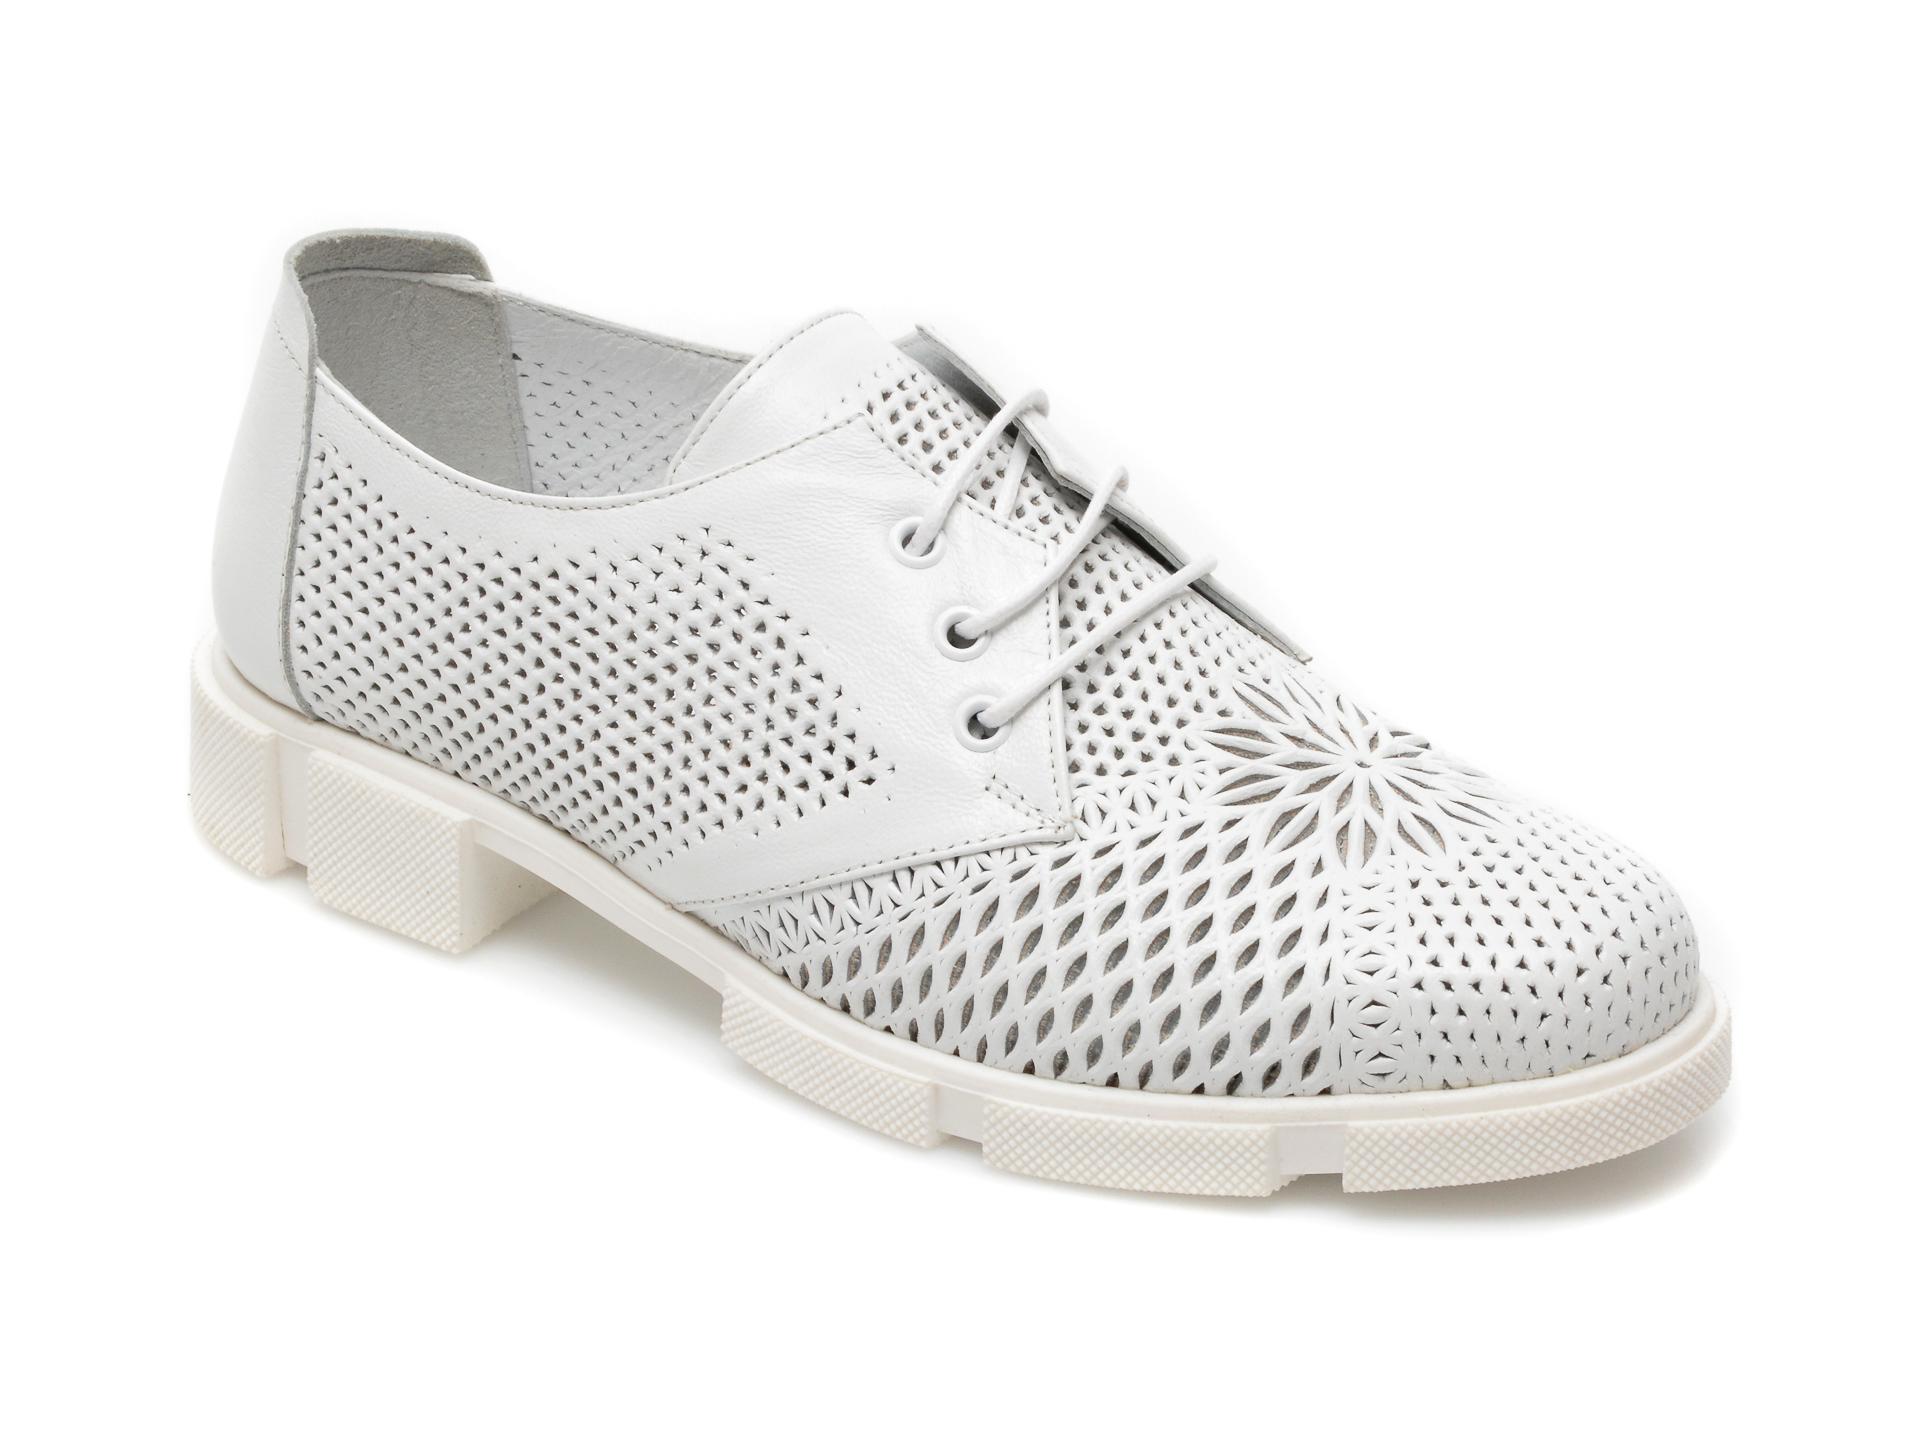 Pantofi MOLLY BESSA albi, MN106, din piele naturala